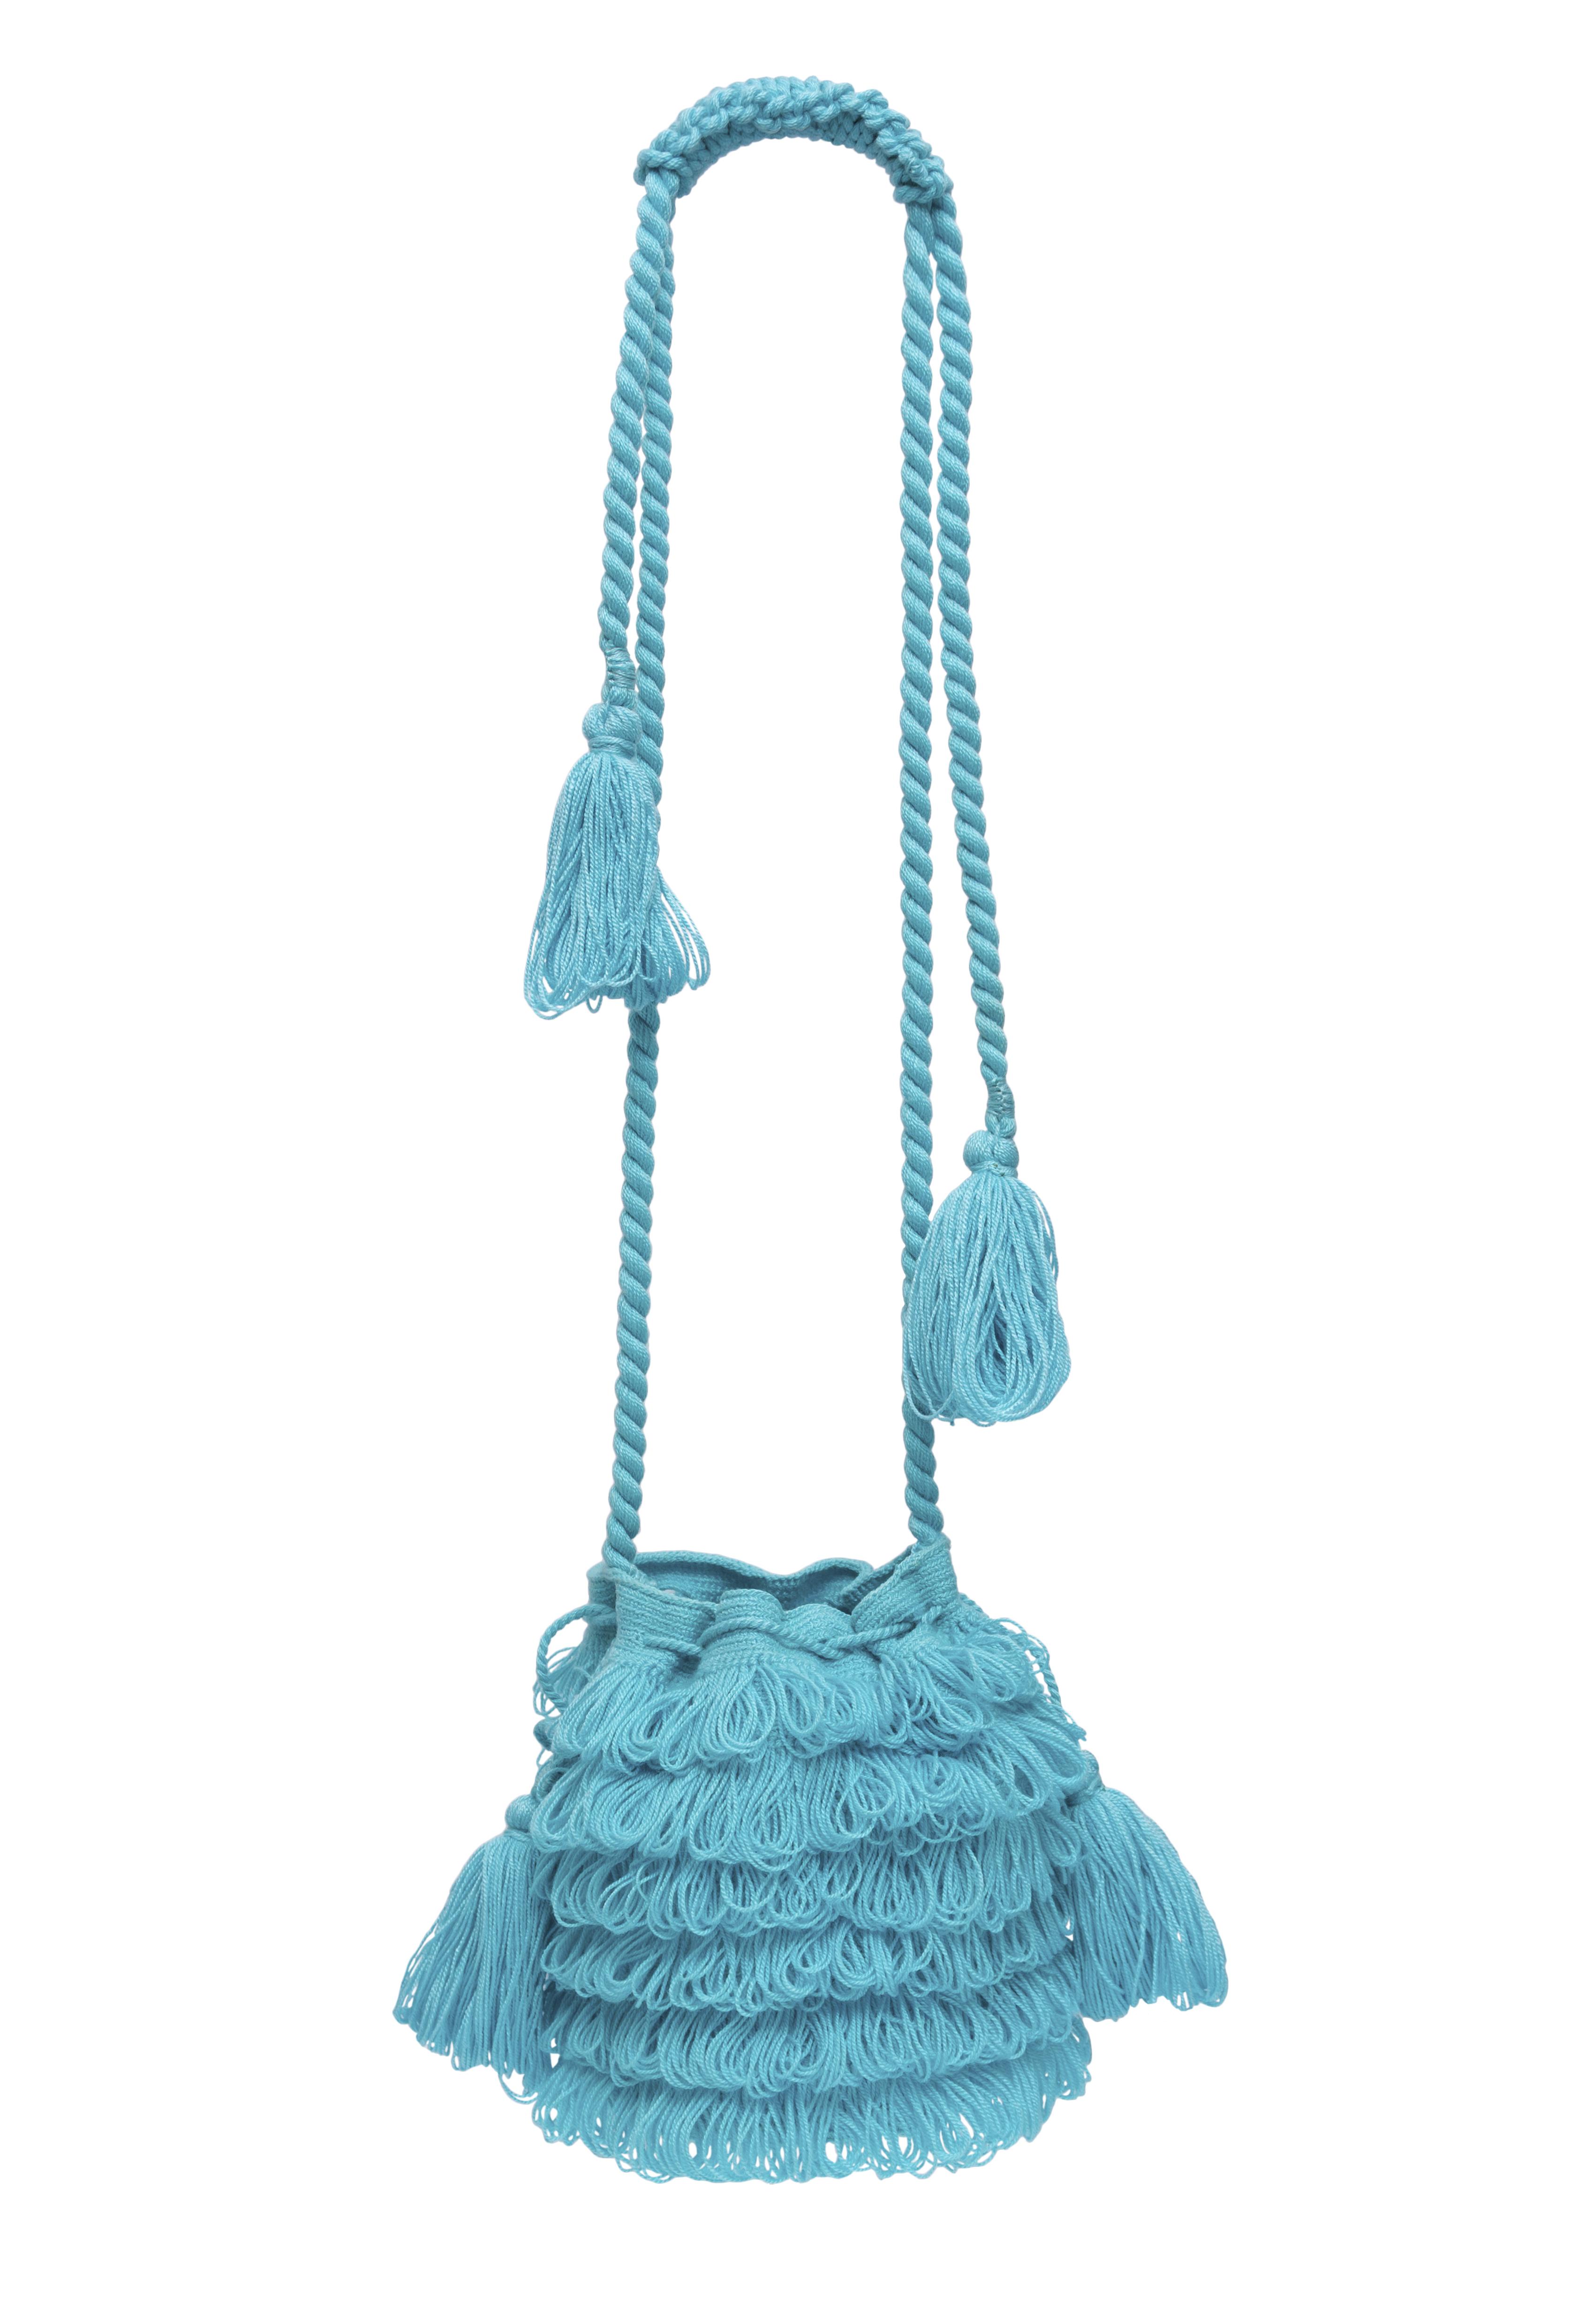 Mochila Bigotes azul turquesa